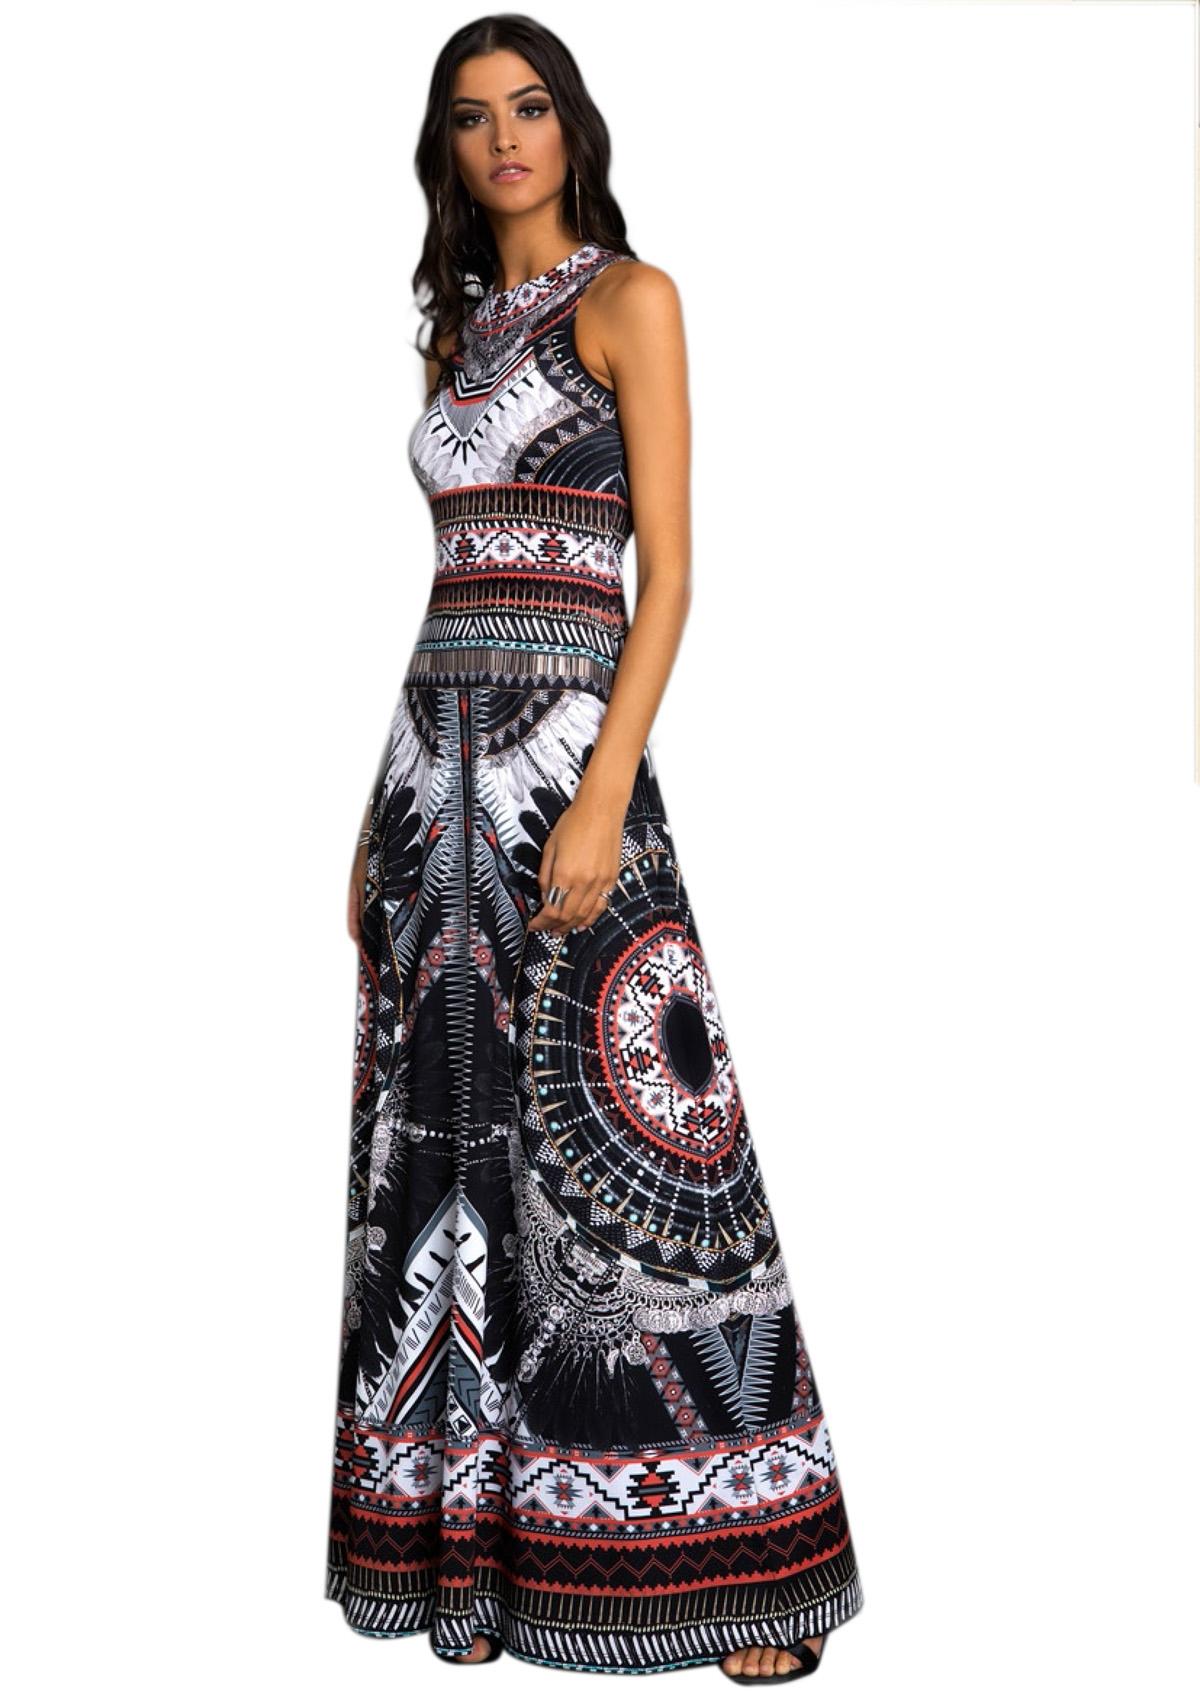 PEACE AND CHAOS CAIRO DRESS - Abebablom Store ca475e2d863